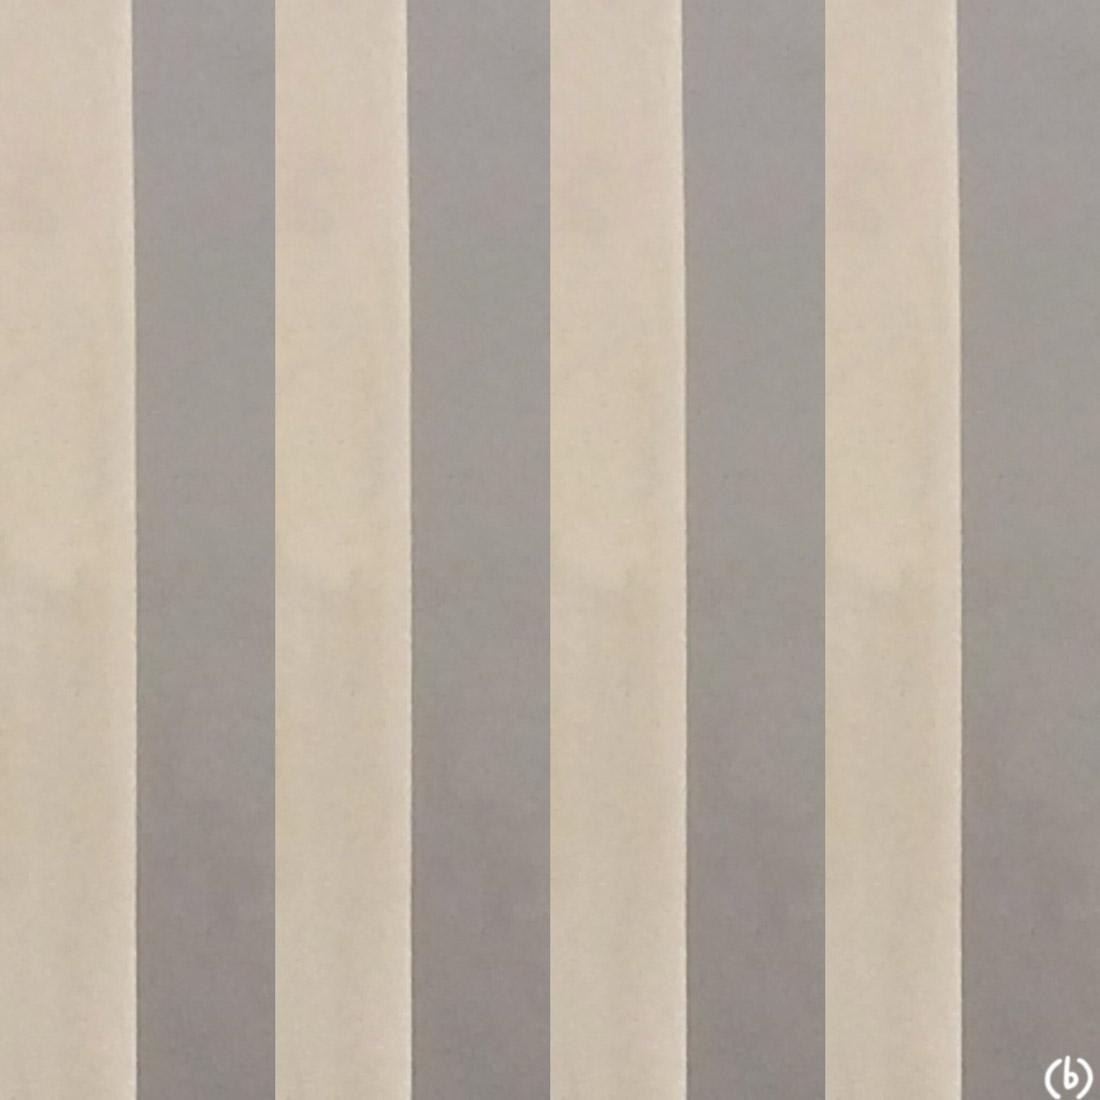 aurea mediocritas: abstract photography by (b)ananartista sbuff